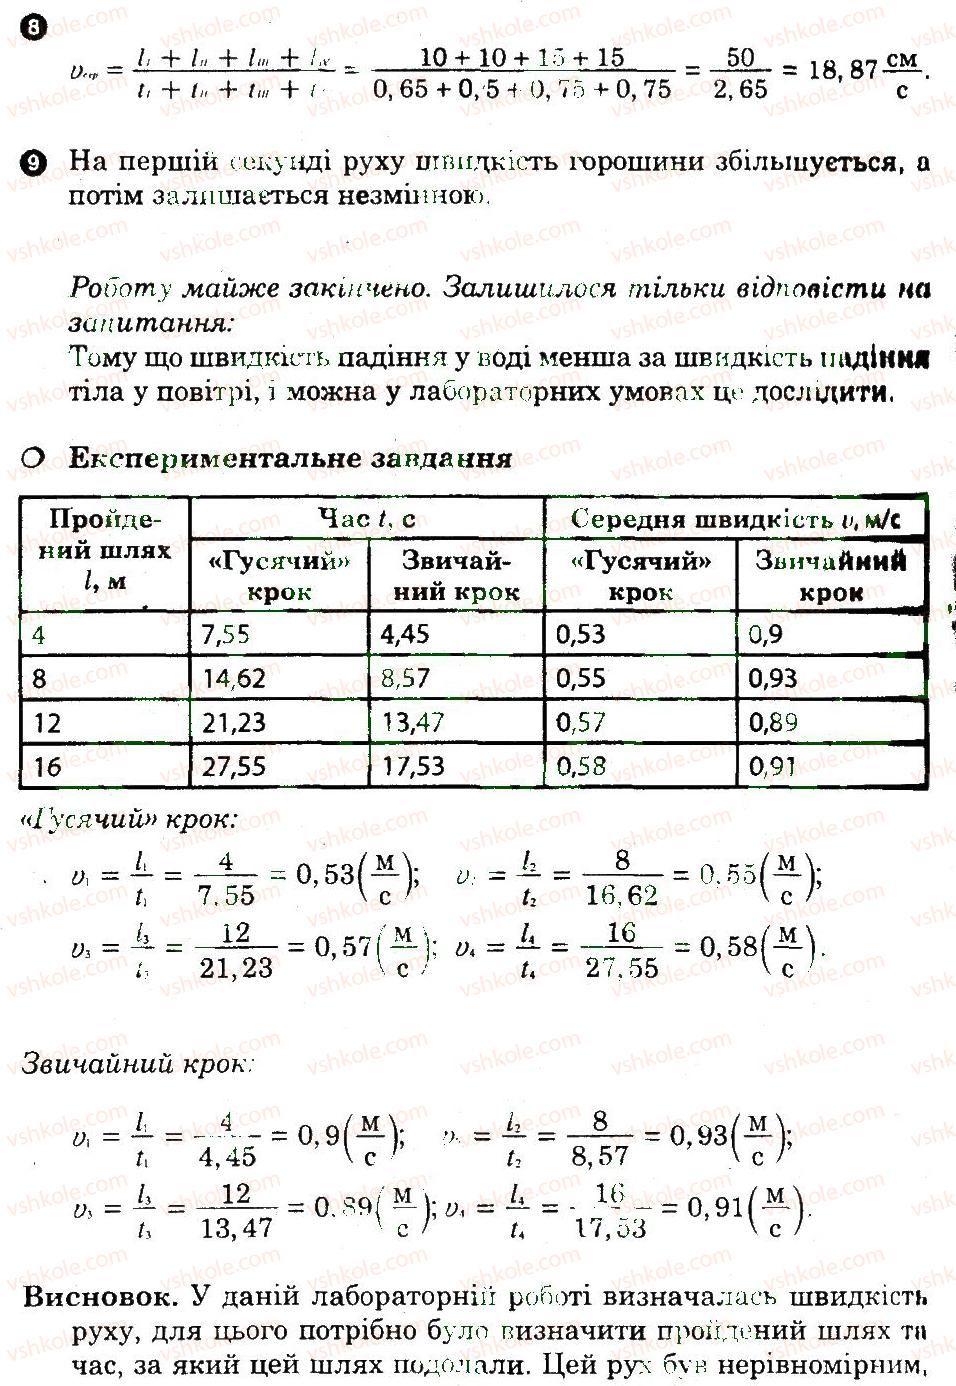 8-fizika-fya-bozhinova-oo-kiryuhina-2010-zoshit-dlya-laboratornih-robit--laboratorni-roboti-1-rnd4677.jpg